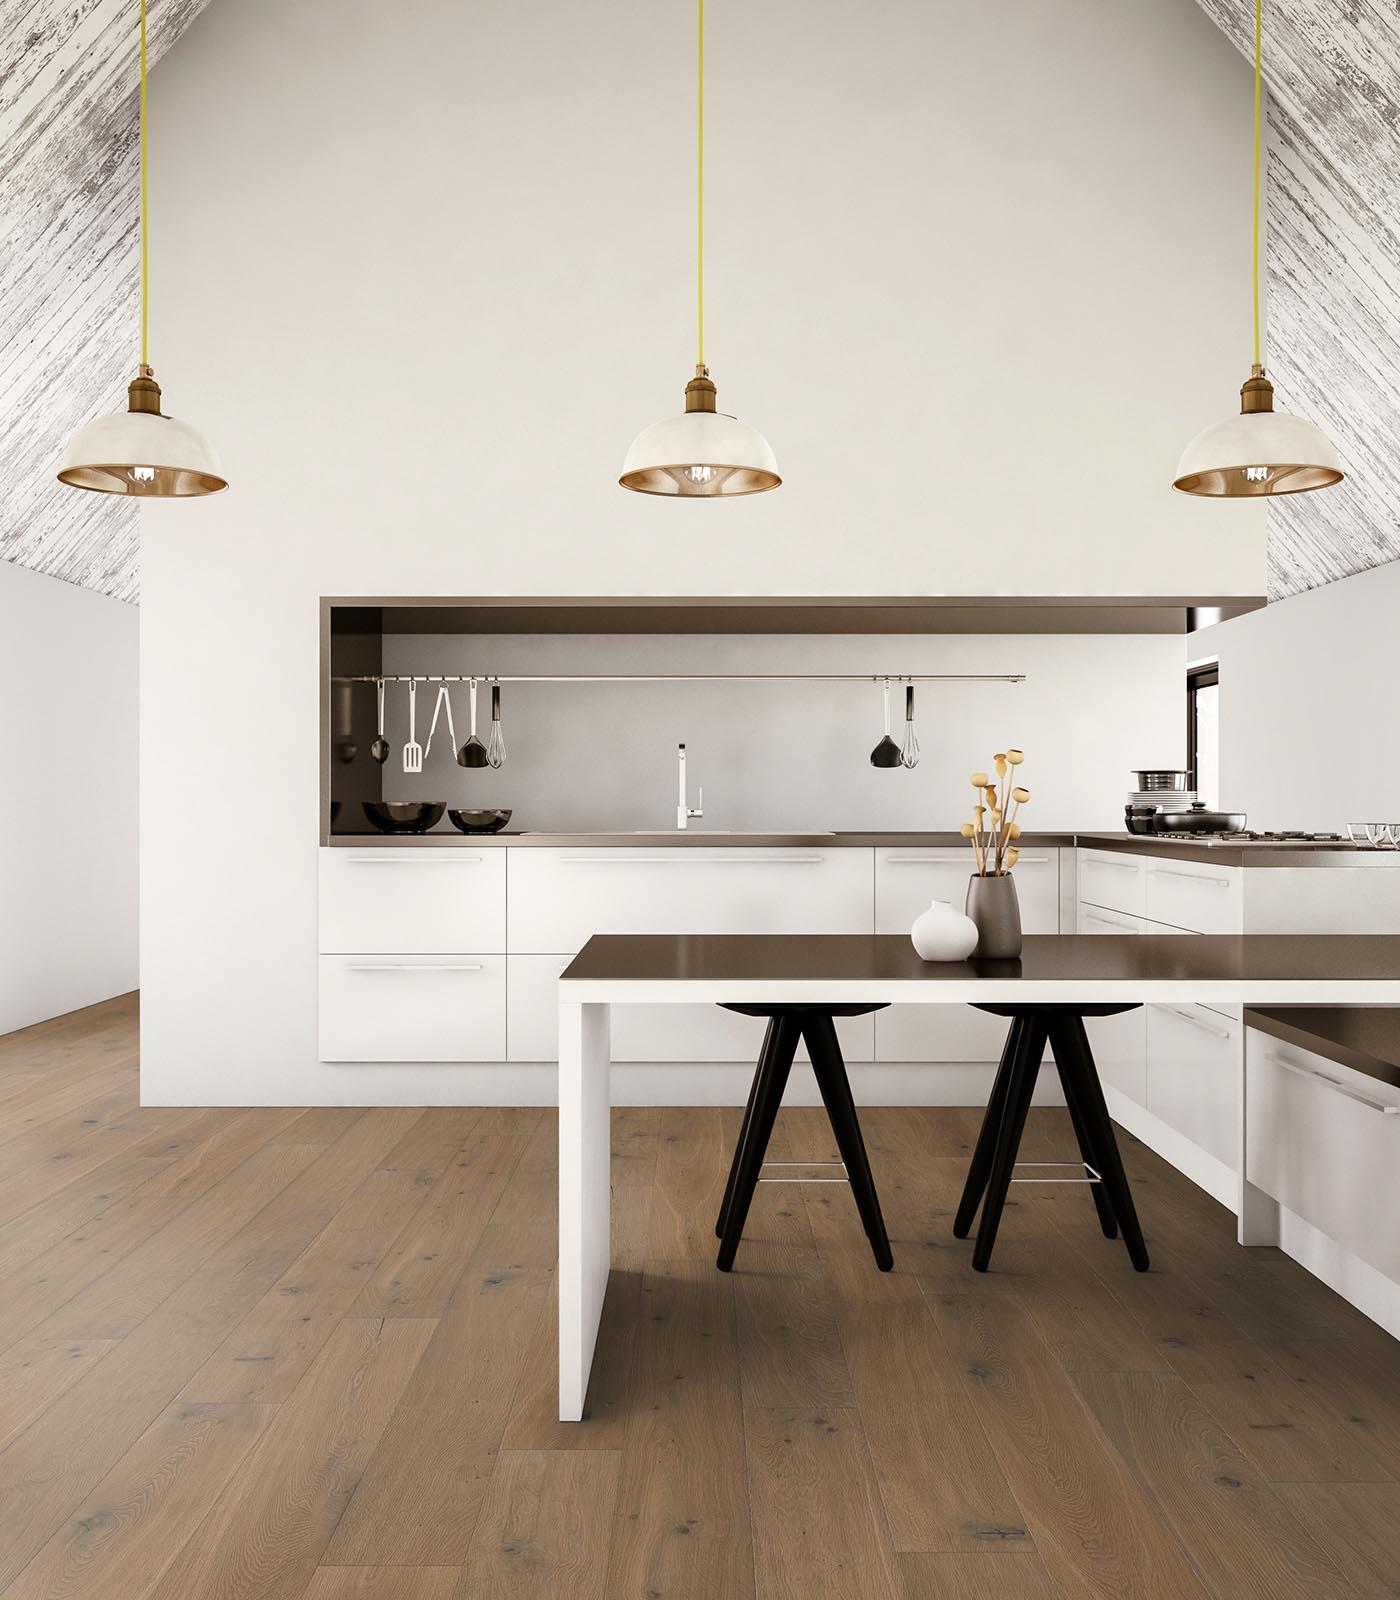 Jungfrau-Antique Collection-European Oak Floors-room